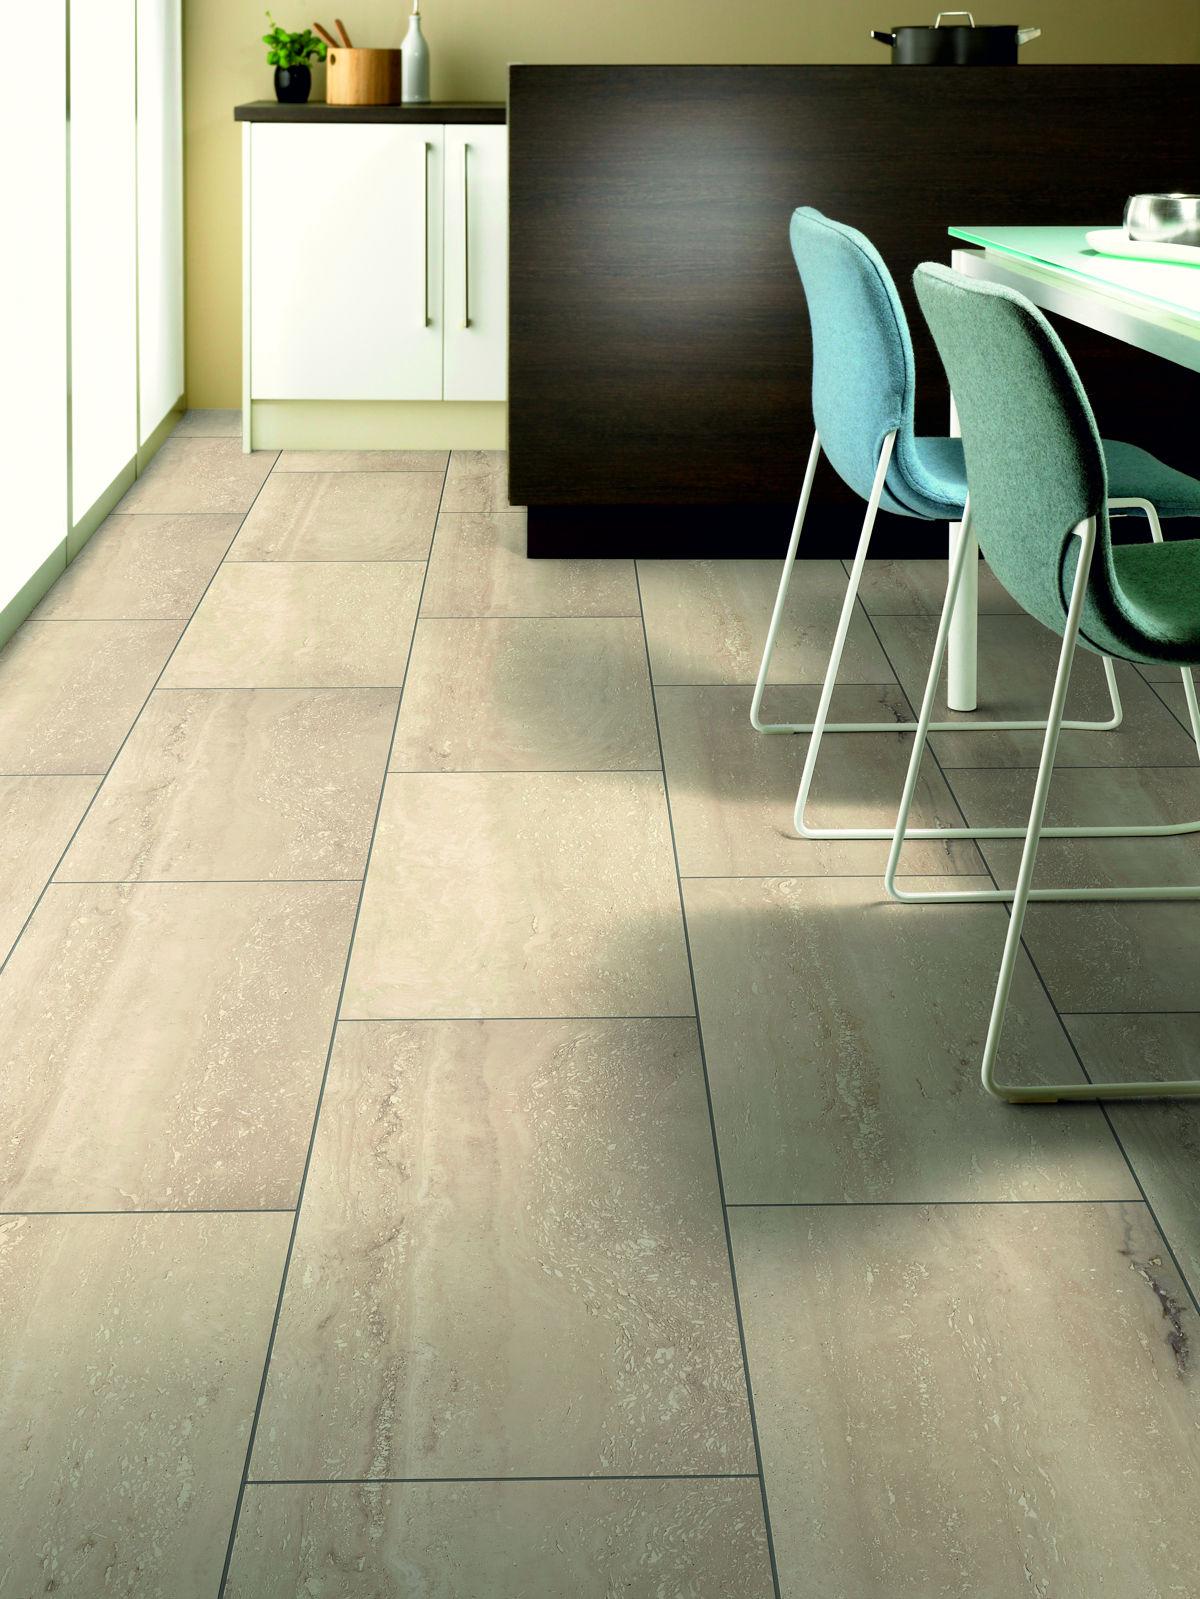 laminate floor tiles kronospan stone impression palatino travertine laminate tile and laminate  flooring combinations OAPJCOT